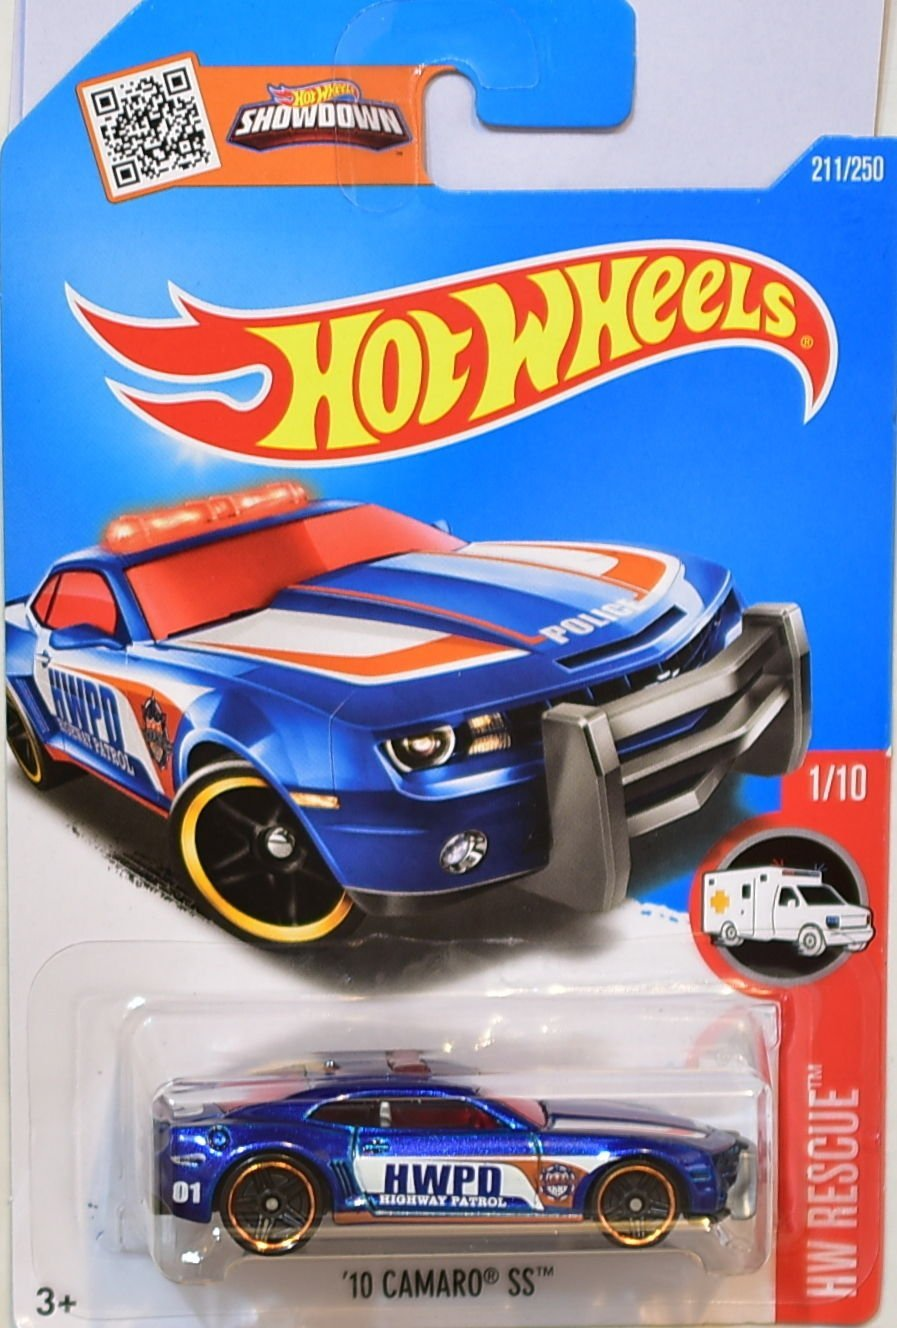 2016 Hot Wheels Hw Rescue 1/10 - '10 Camaro SS (Blue)